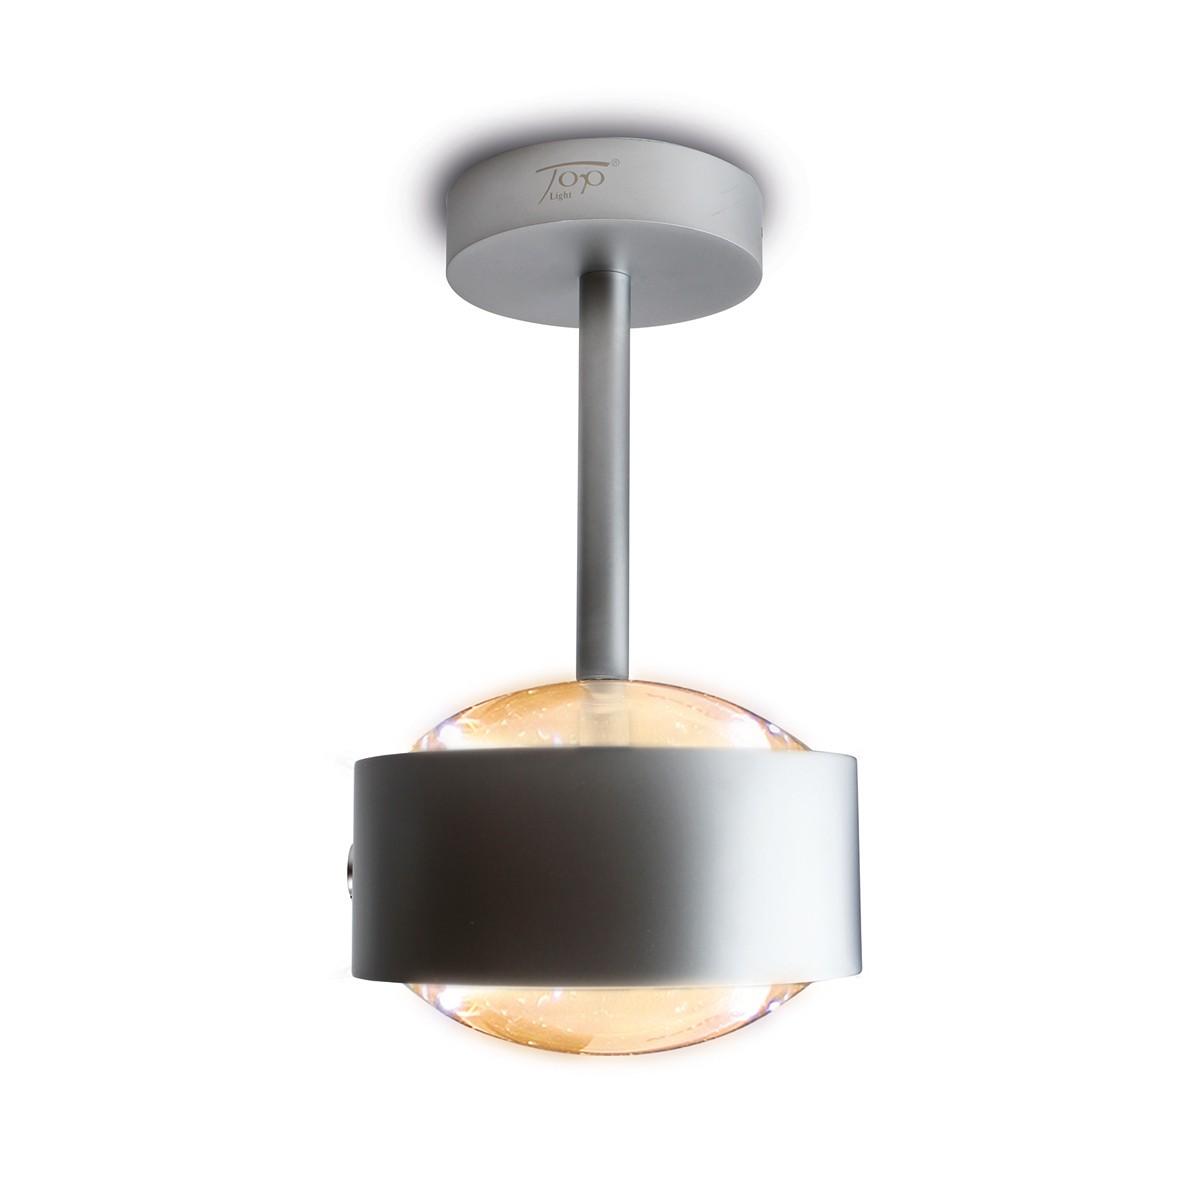 Top Light Puk Maxx Eye Ceiling Deckenleuchte